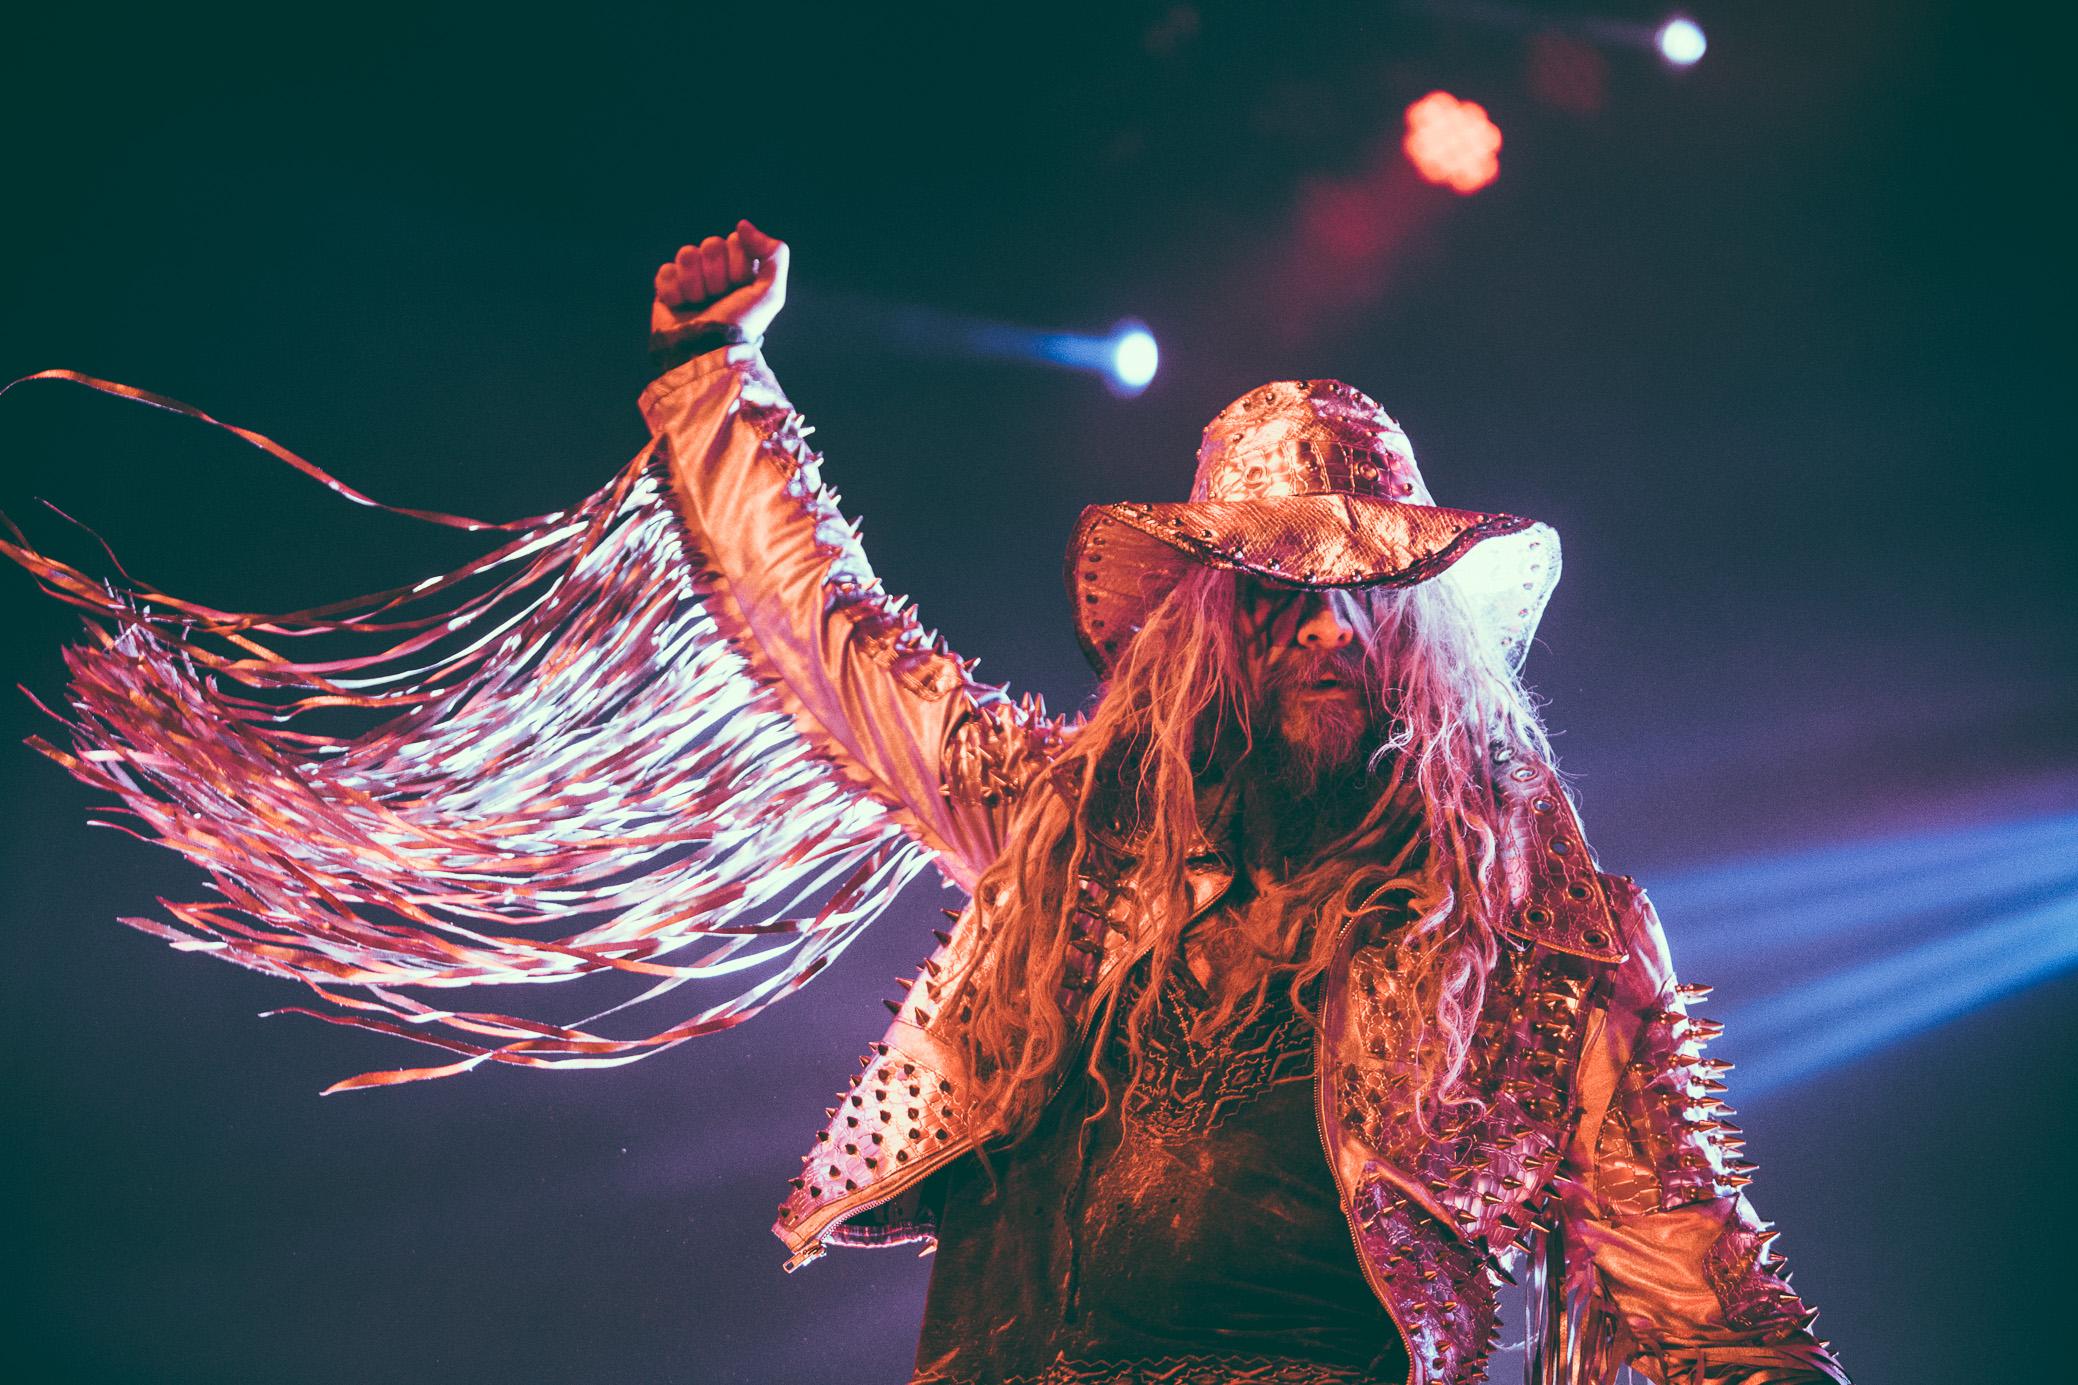 Rob Zombie performs at the Coca-Cola Roxy Theatre in Atlanta, Georgia on October 3rd, 2017. (Photo by David A. Smith/DSmithScenes)